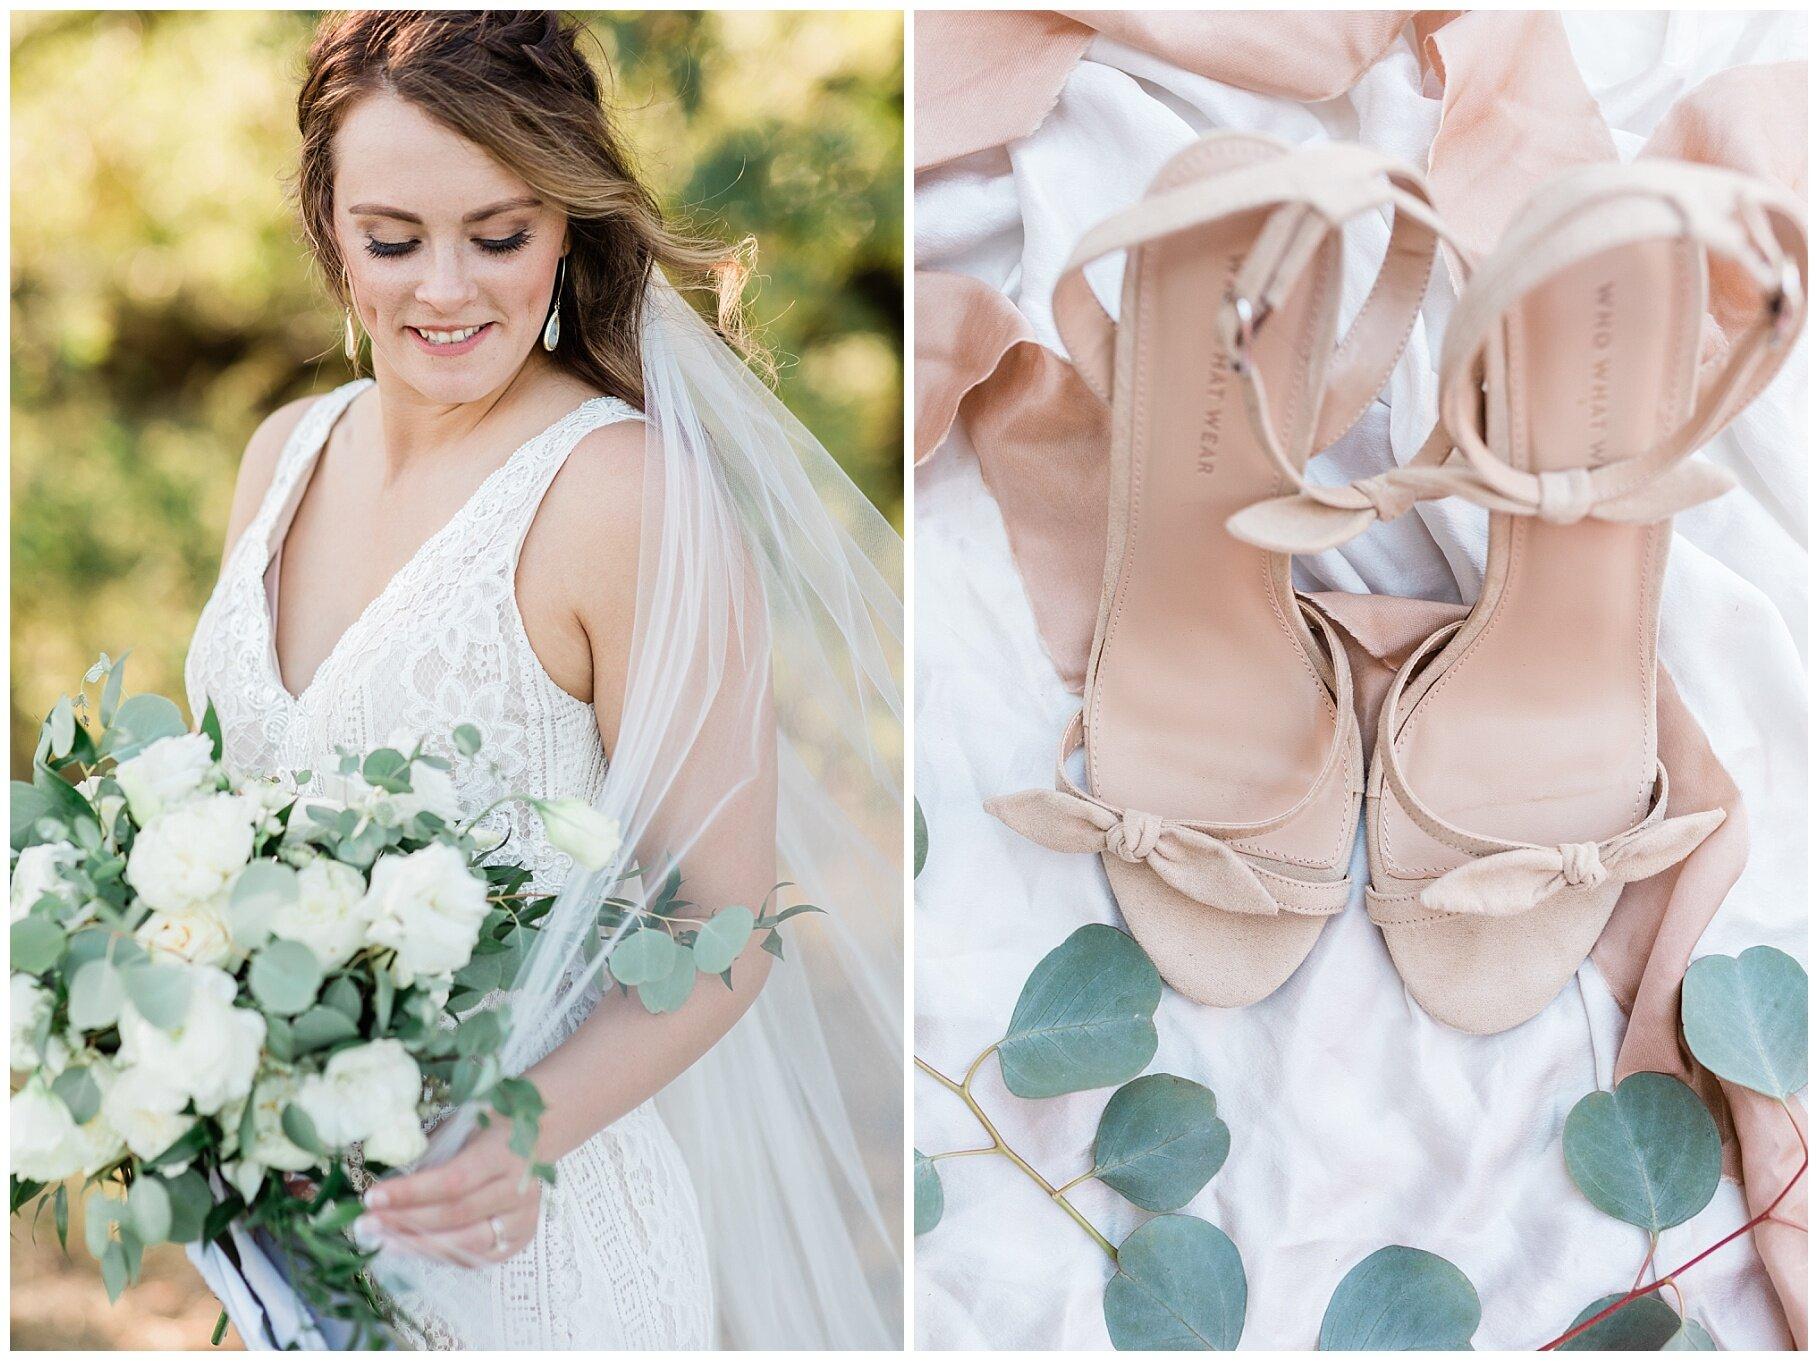 Earth-Toned Wedding by KKP Associate Wedding Photographer and Kelsi Kliethermes Photography Best Columbia Missouri Wedding Photographer_0032.jpg